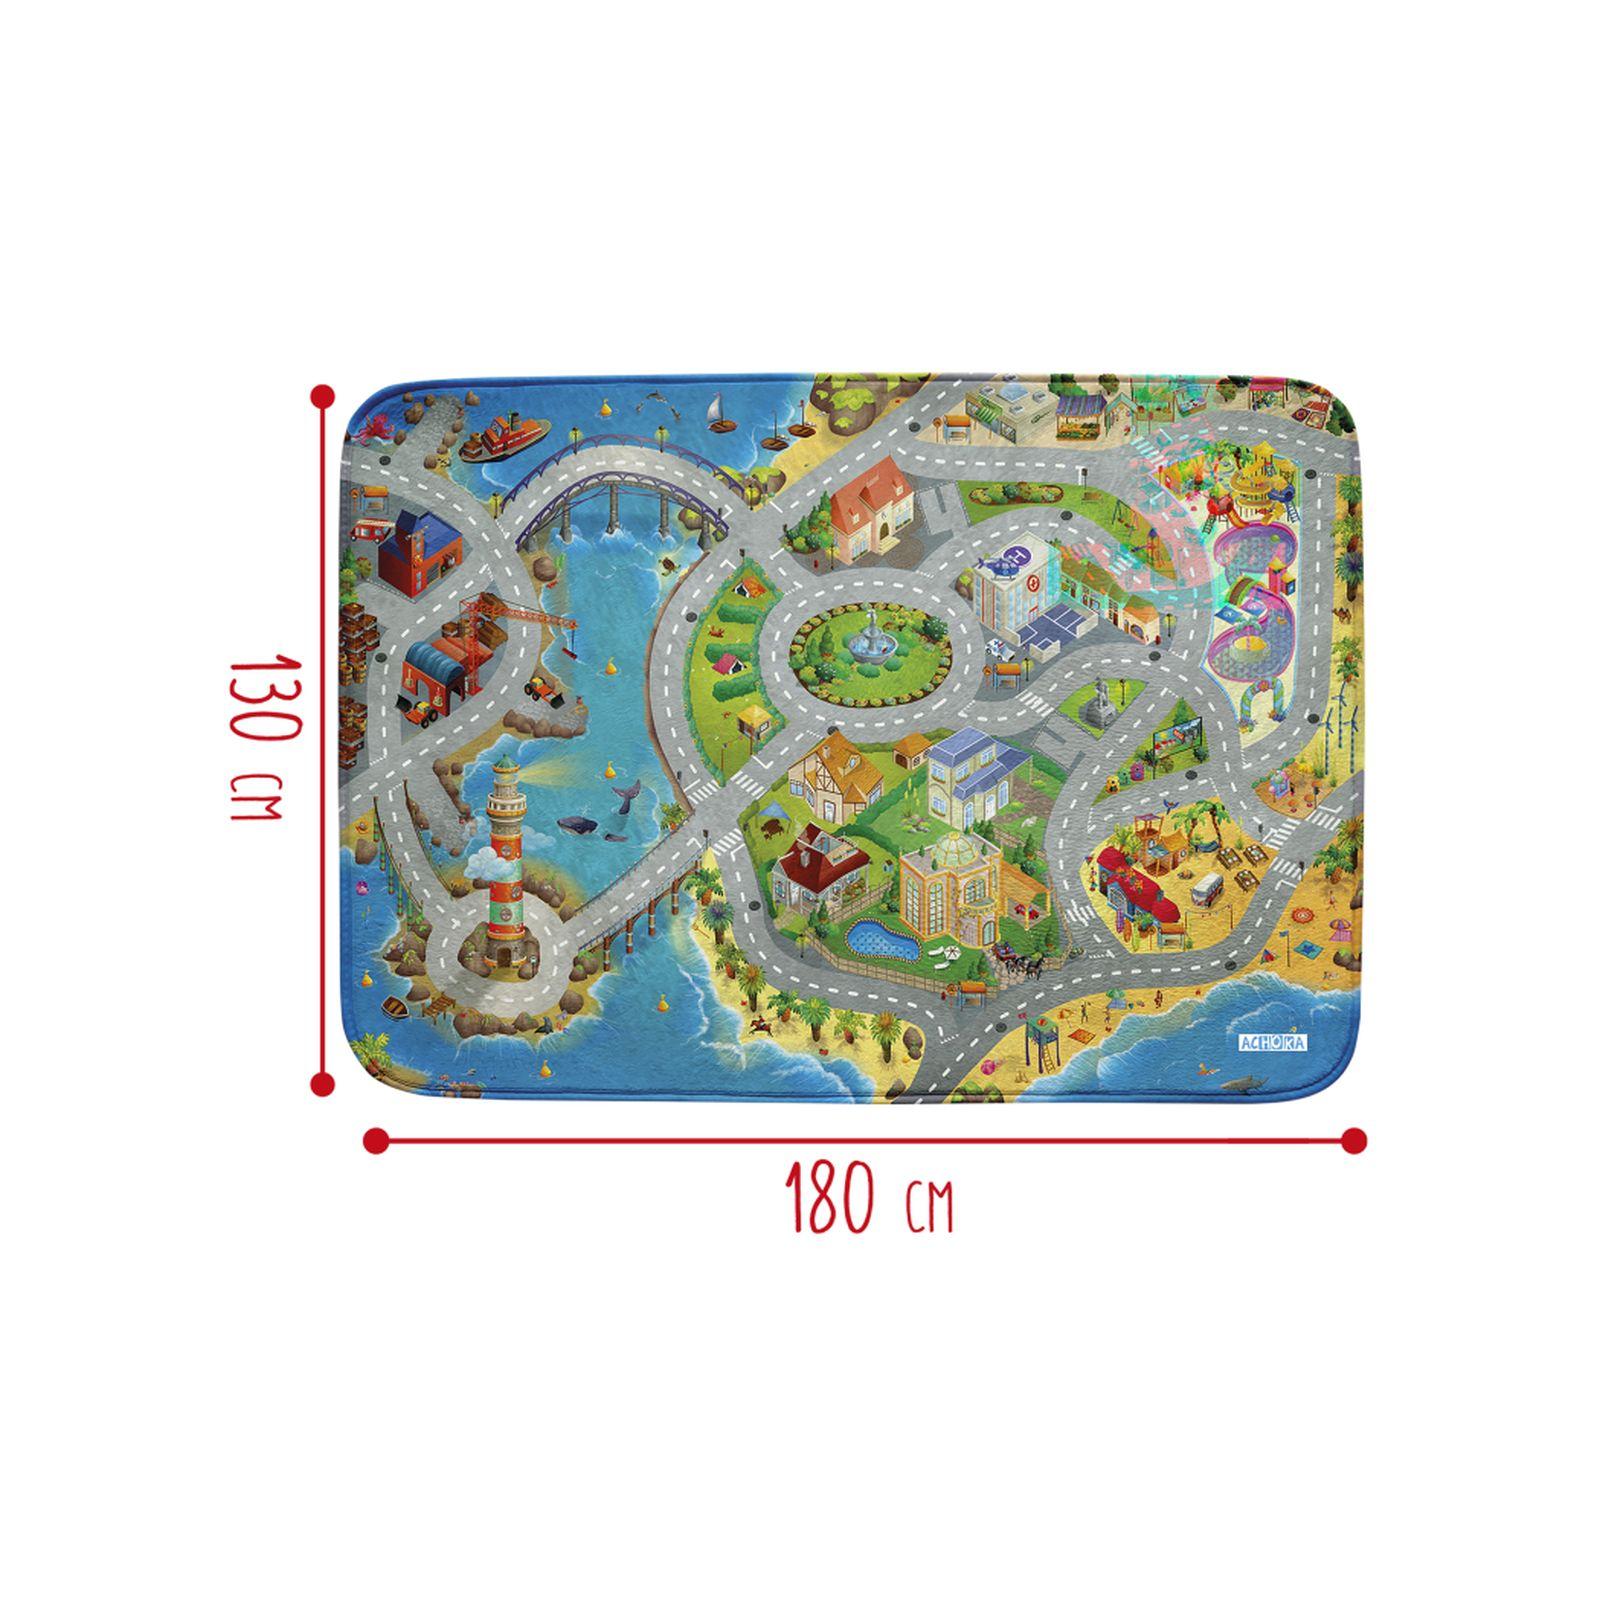 Tappeto gioco 130 x 180 - MOTOR&CO